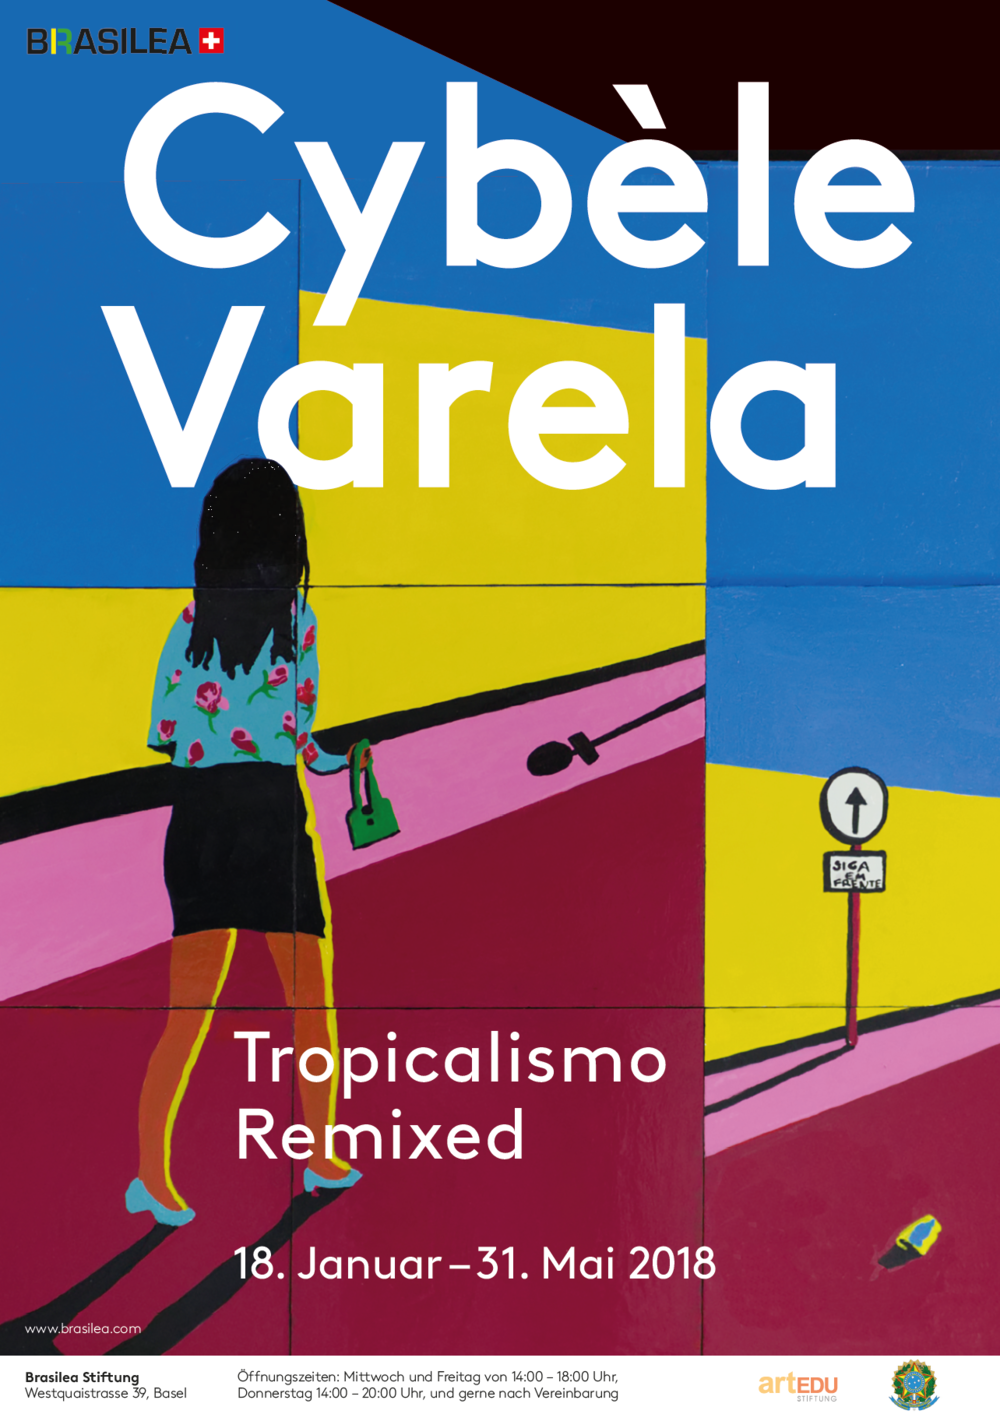 Exhibition Poster by Simone Züger. Cybèle Varela,  Siga em frente , industrial paint on wood, 2016 © Cybèle Varela 2017